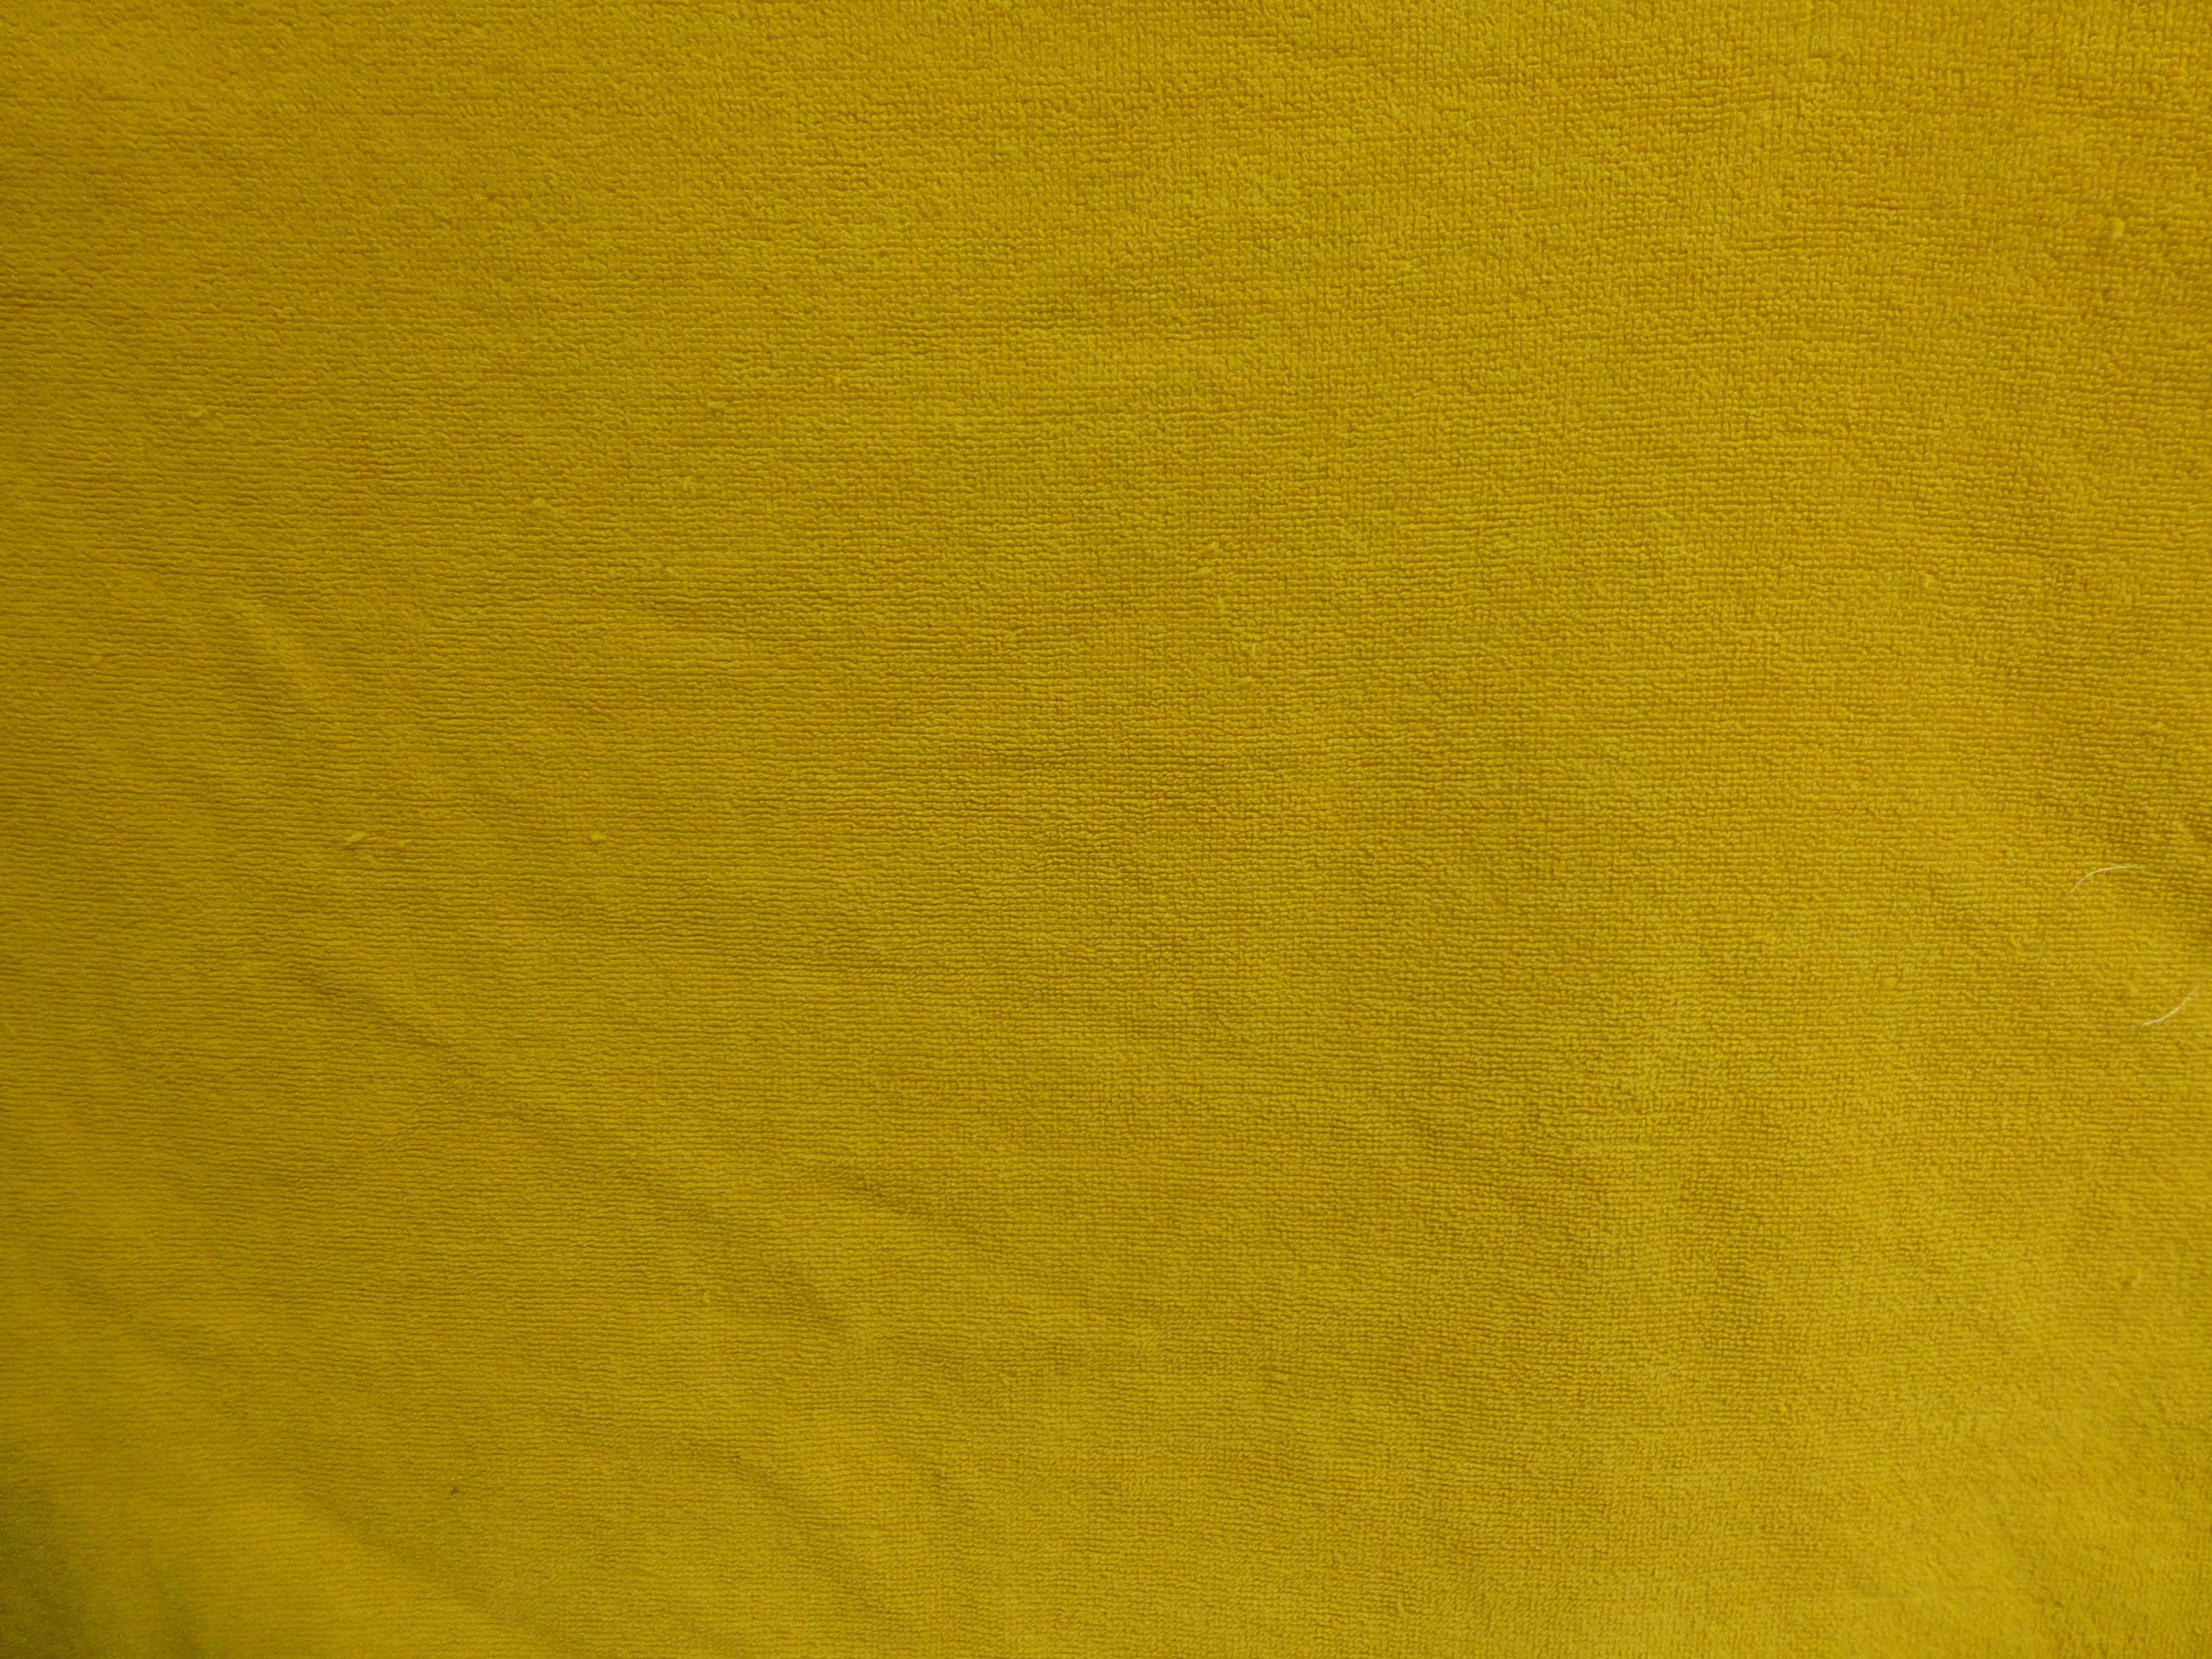 Free stock photo of texture, yellow, warm, fabric